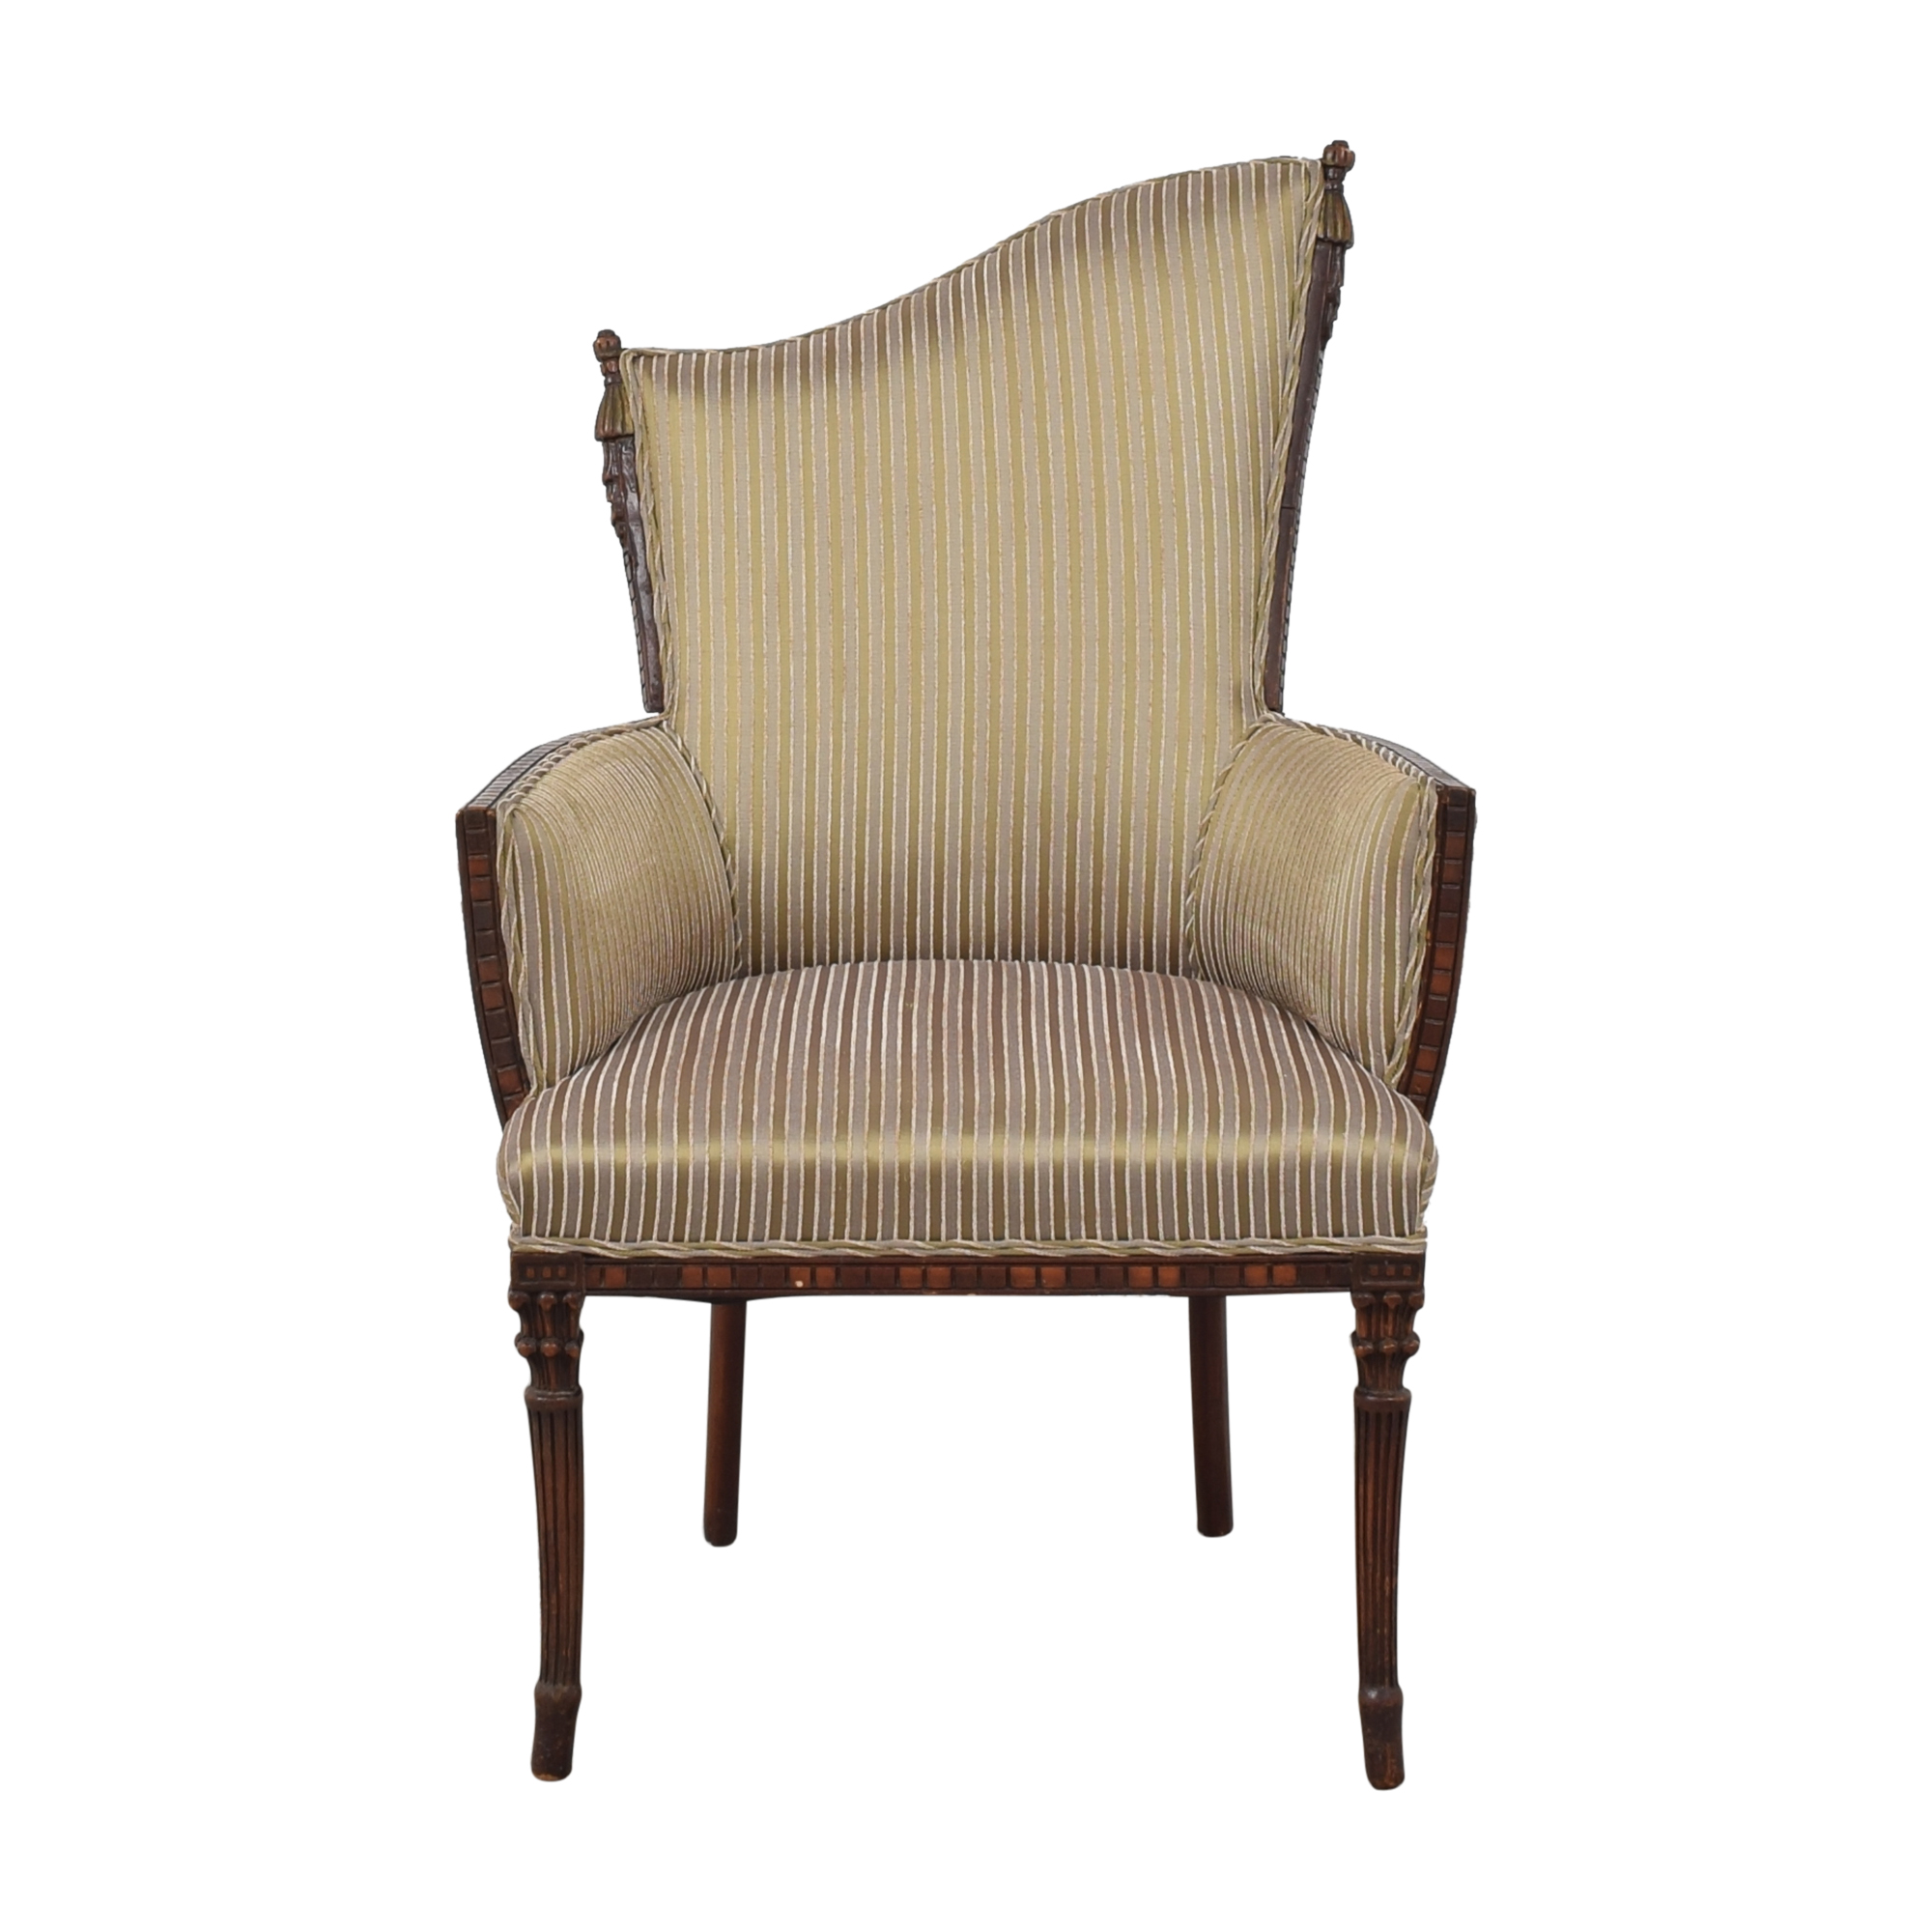 Custom Upholstered Art Deco-Style Arm Chair sale